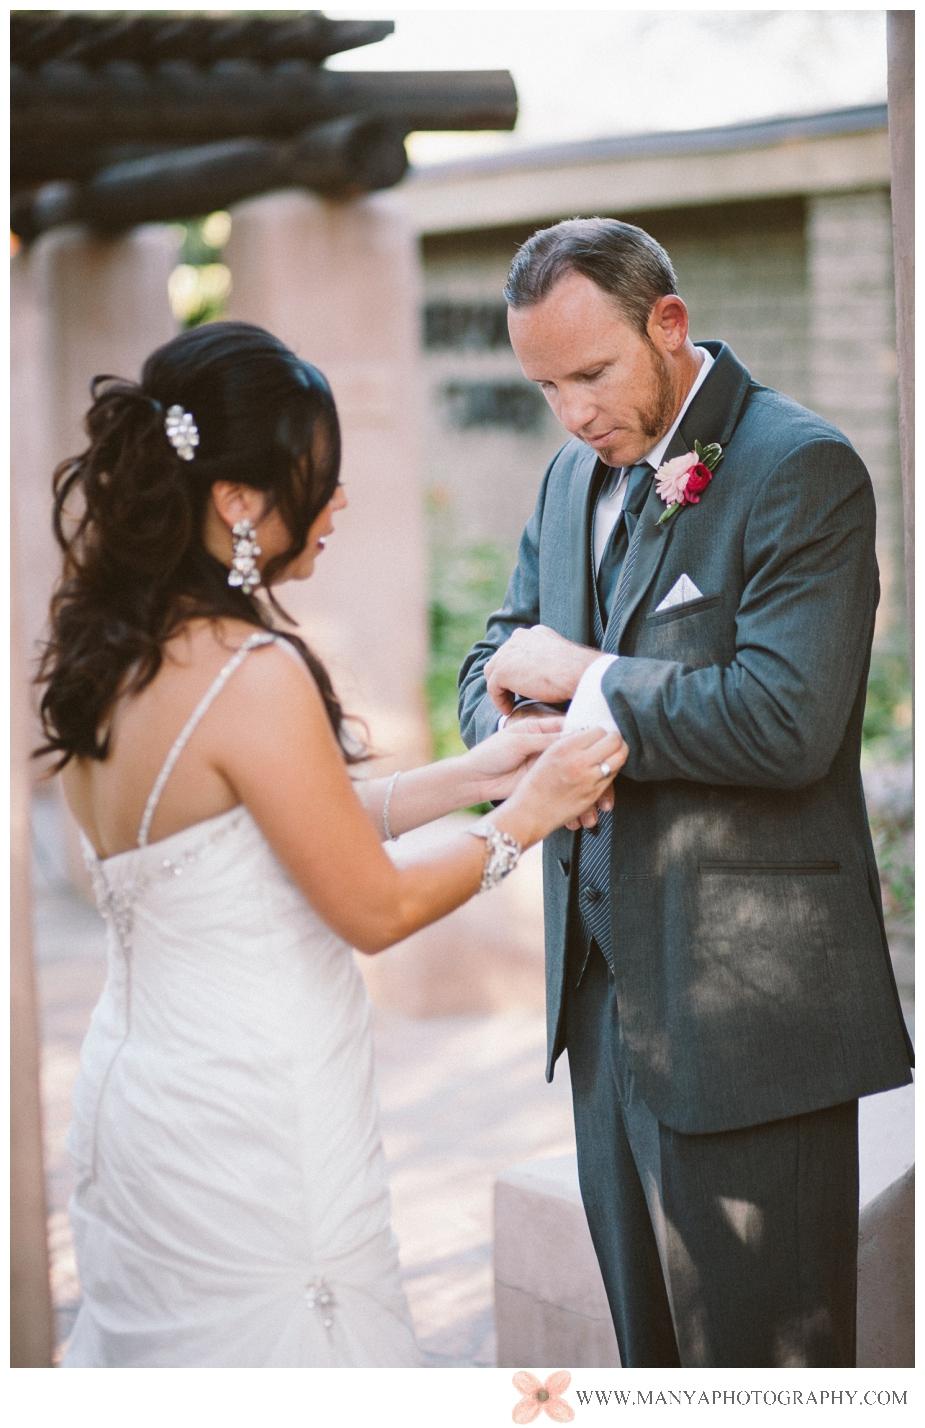 2013-07-28_0018 - Orange County Wedding Photographer